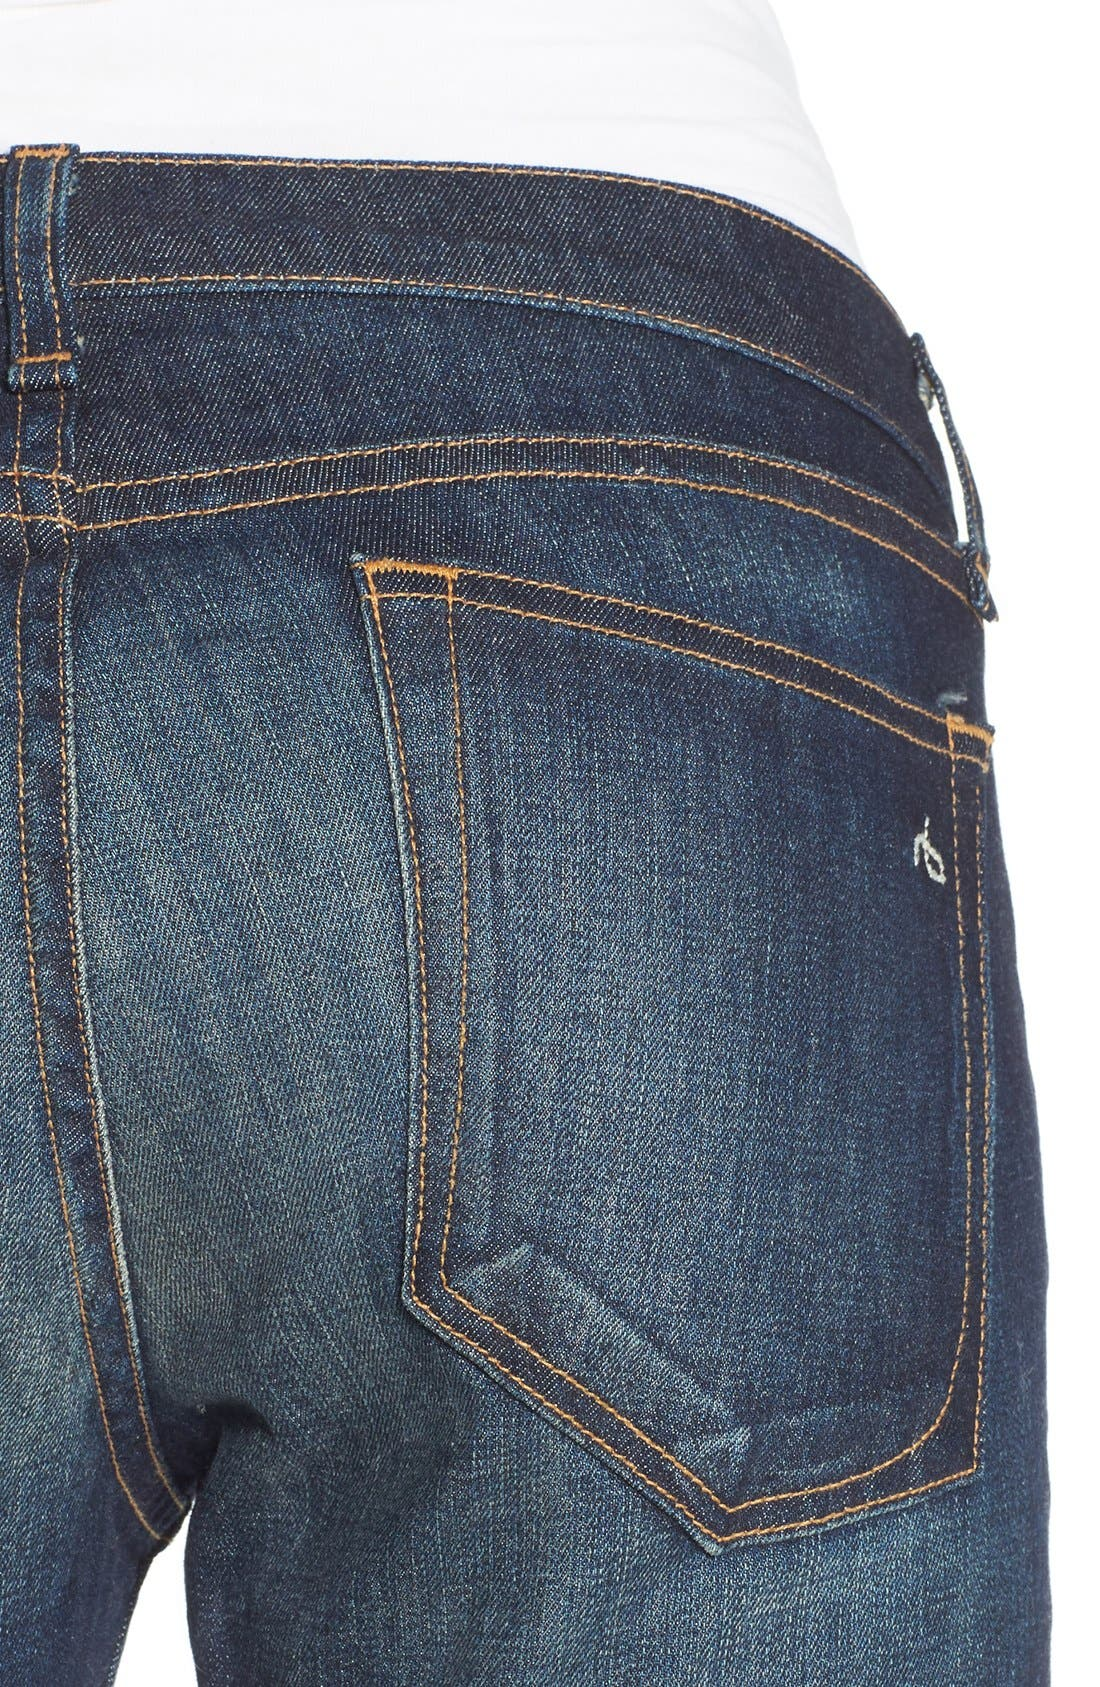 Alternate Image 5  - rag & bone/JEAN 'The Dre' Slim Fit Boyfriend Jeans (Yesler)